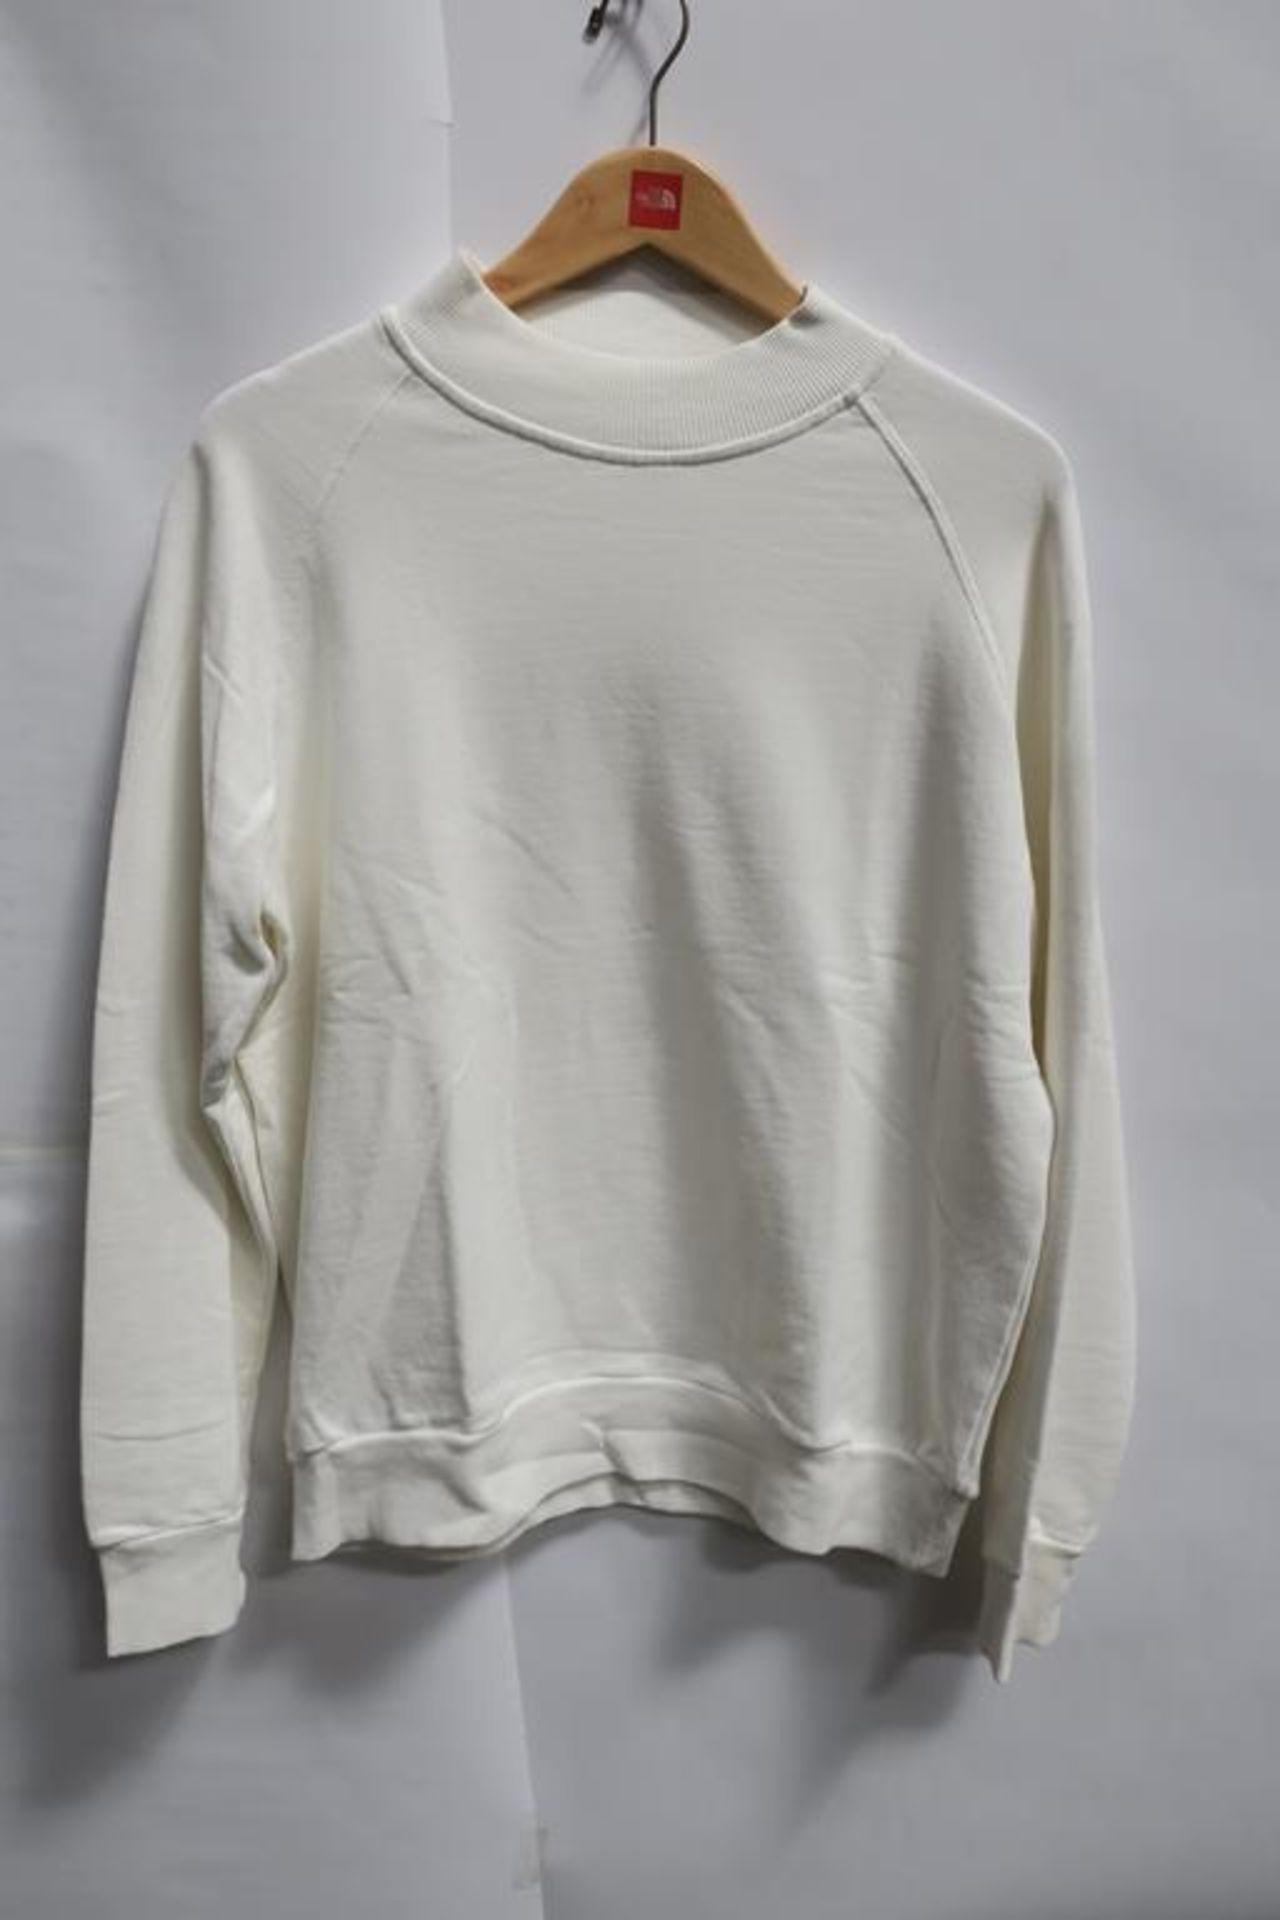 Lot 738 - Quantity of Clothing